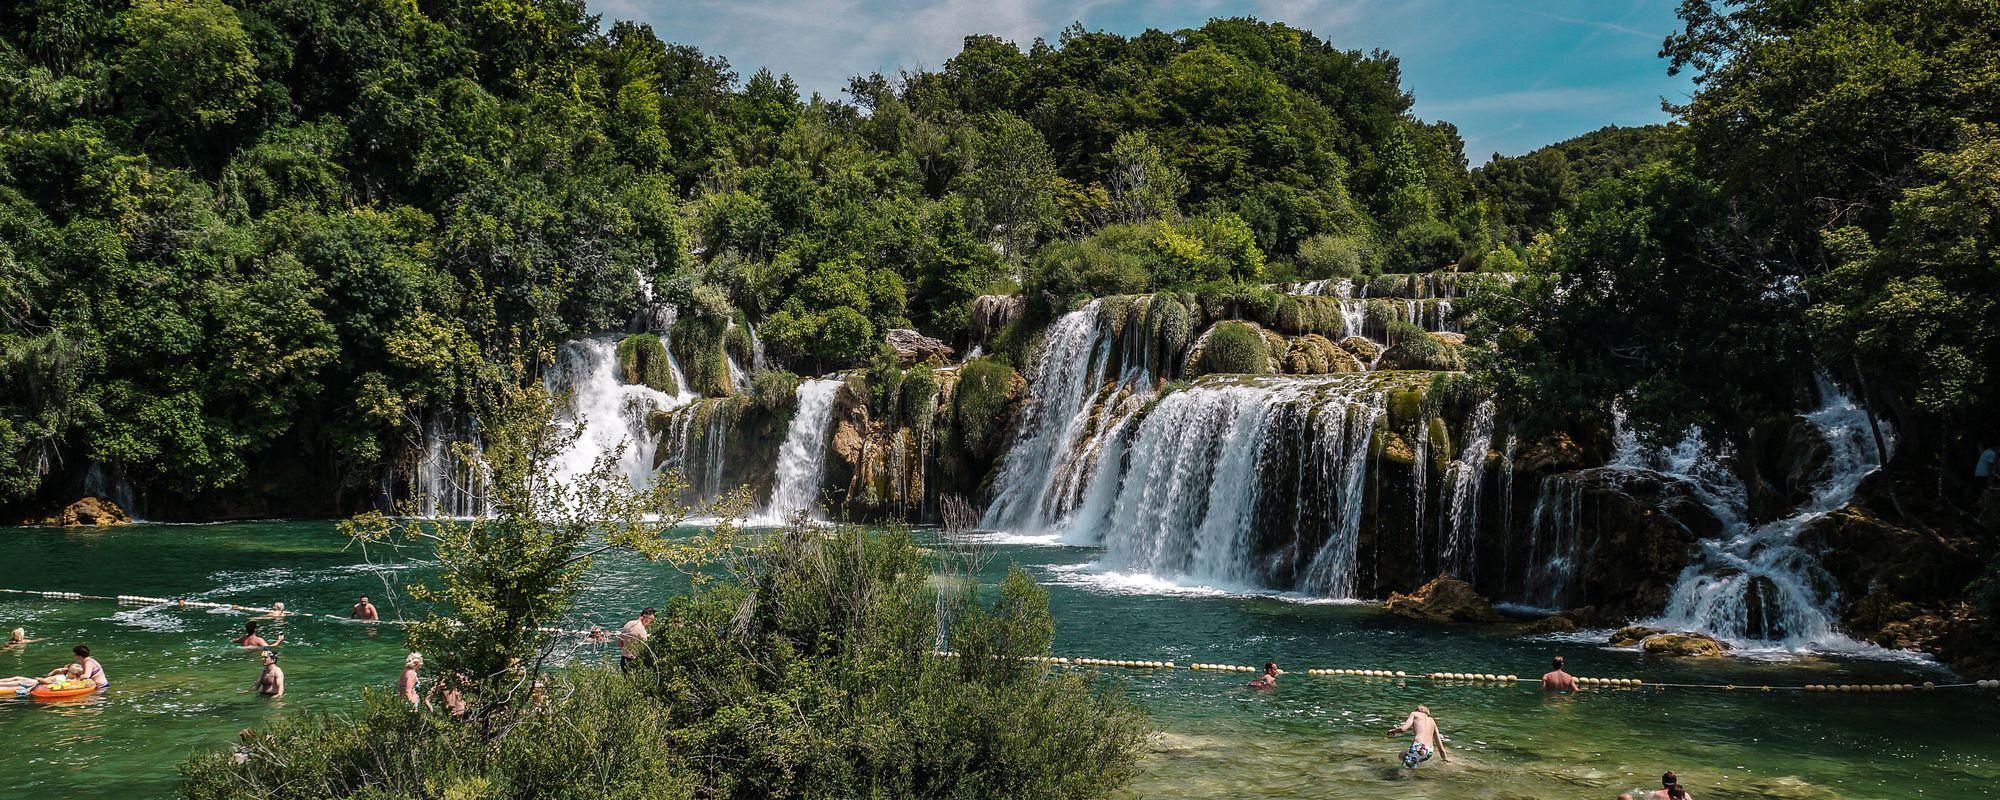 Swimming in the waterfalls at Krka National Park